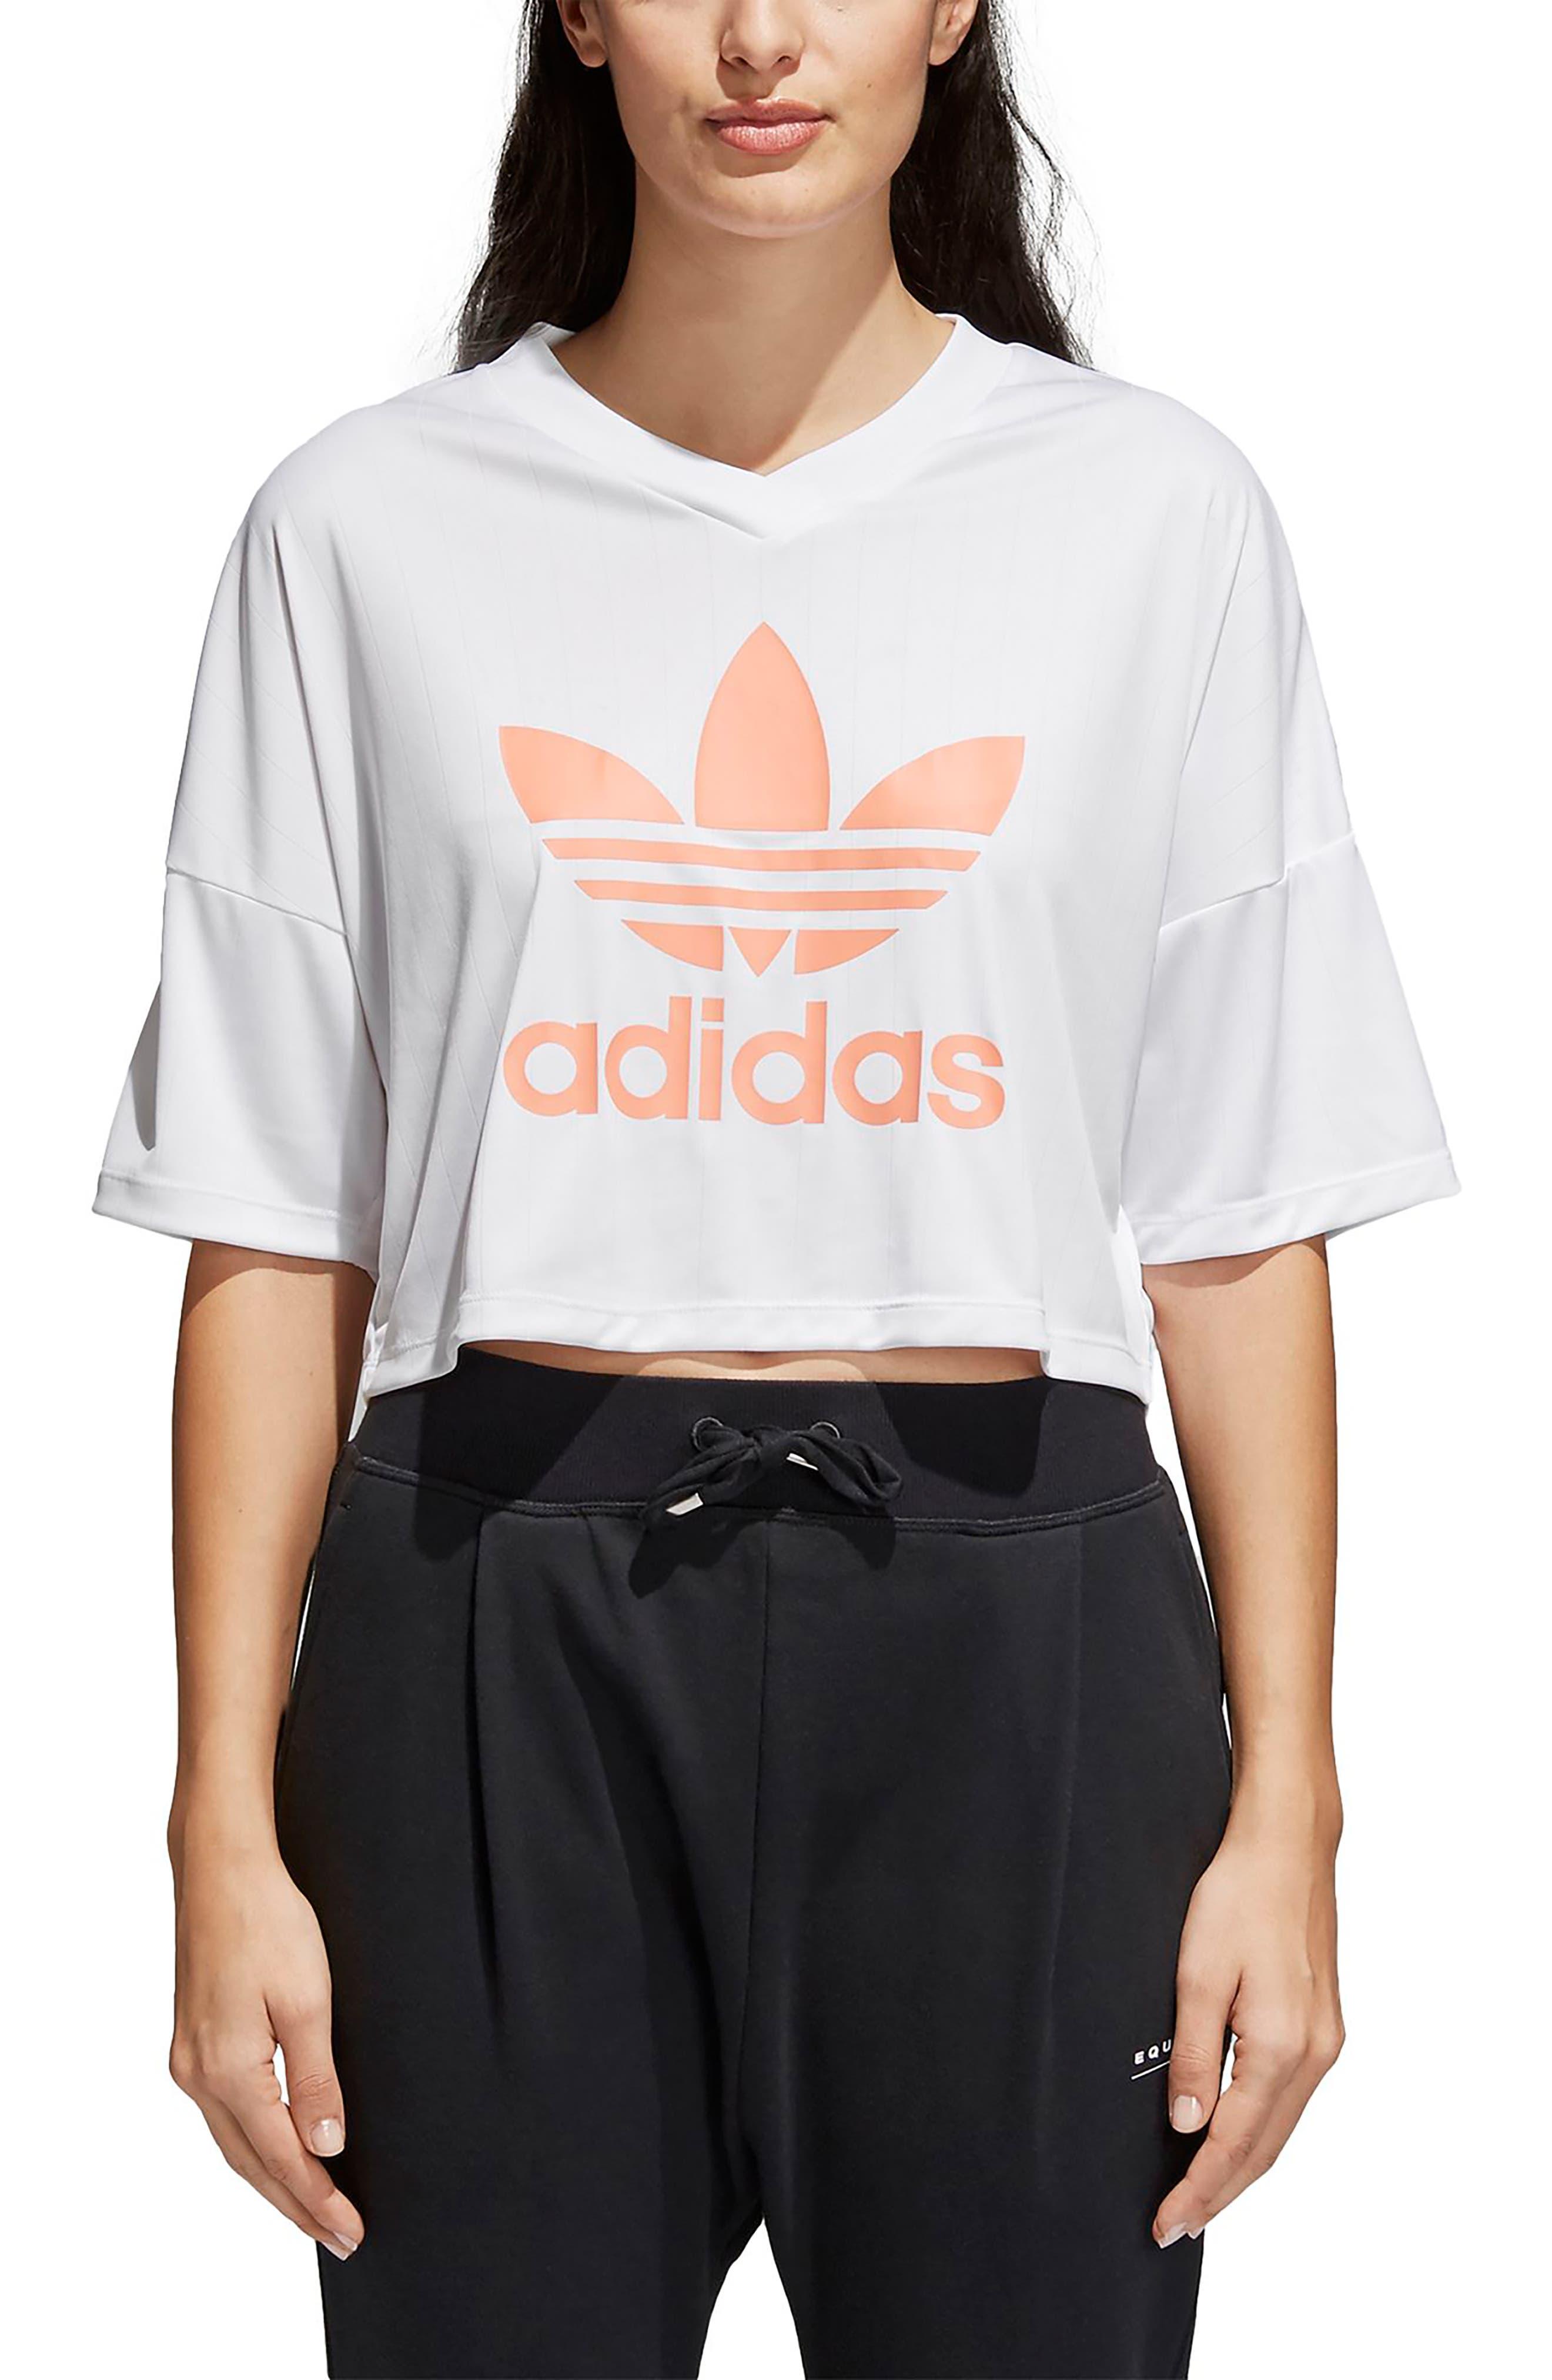 Main Image - adidas Originals Trefoil Crop Tee